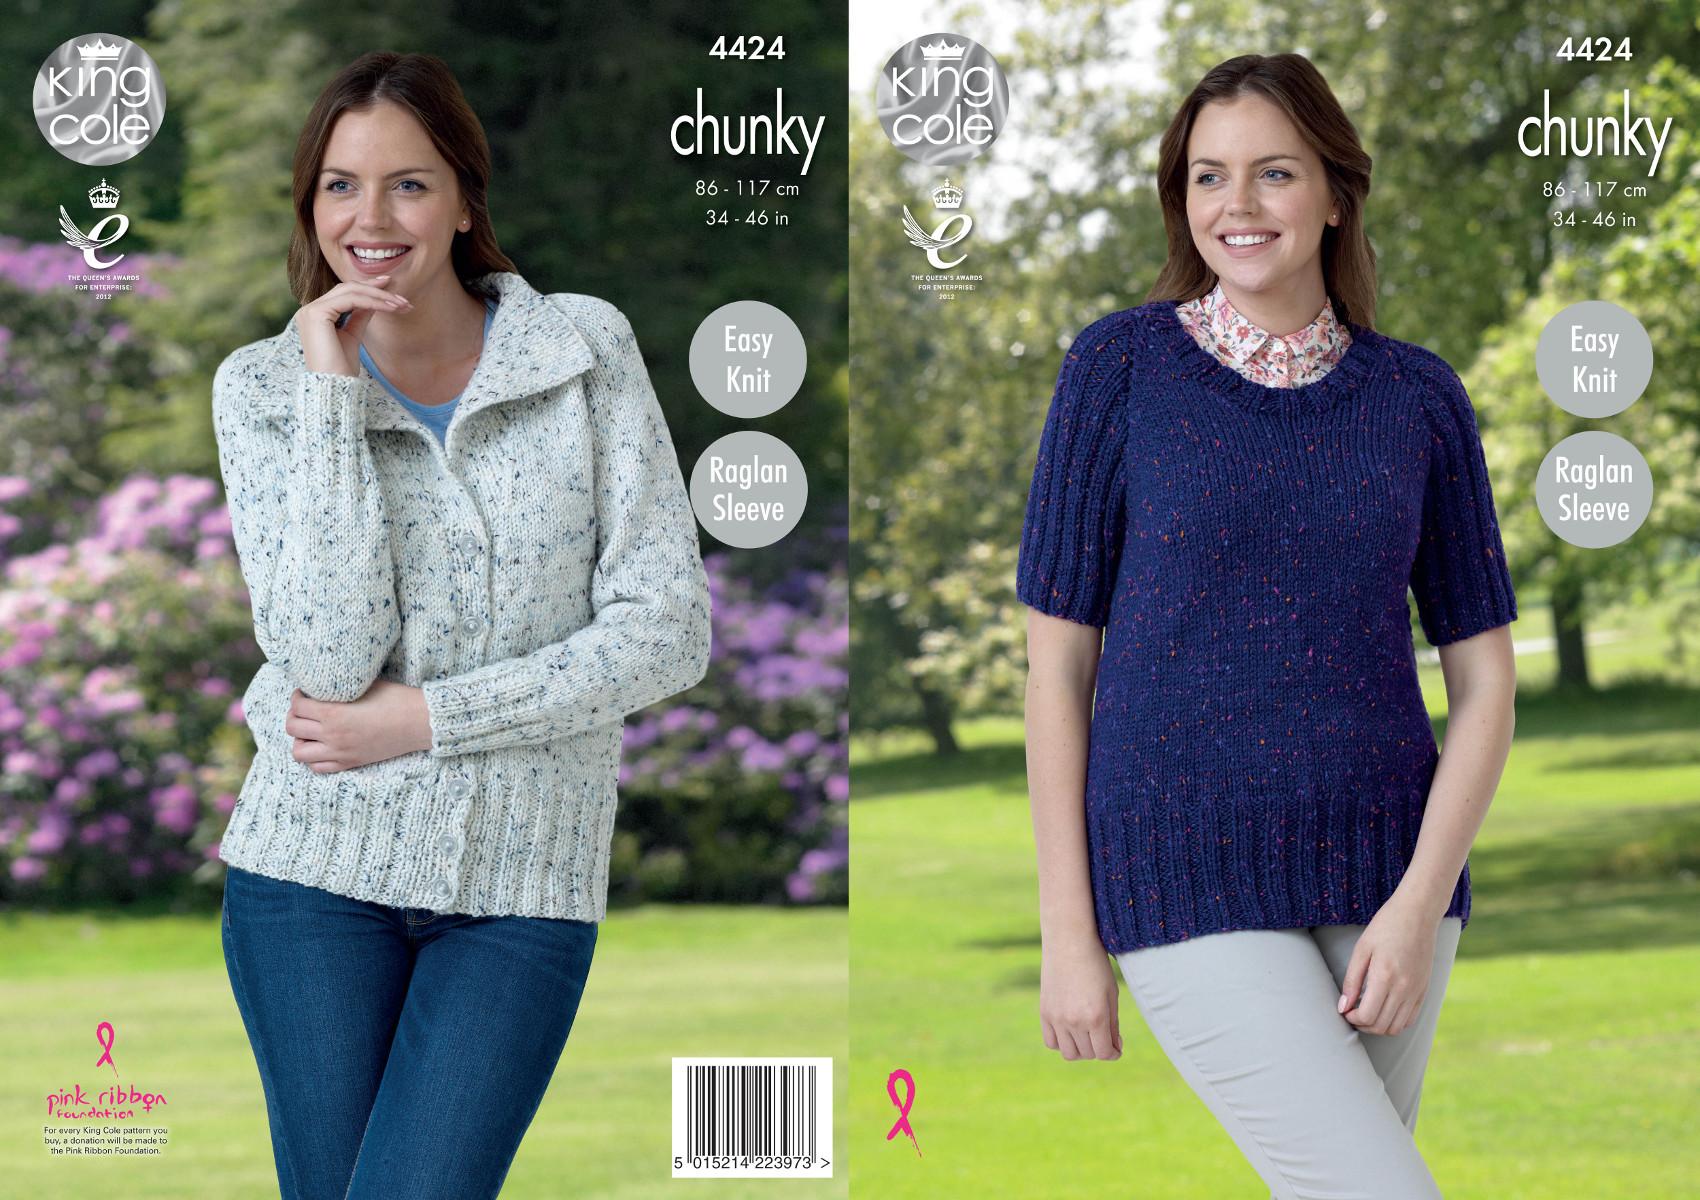 King Cole Ladies Knitting Pattern Easy Knit Jacket ...